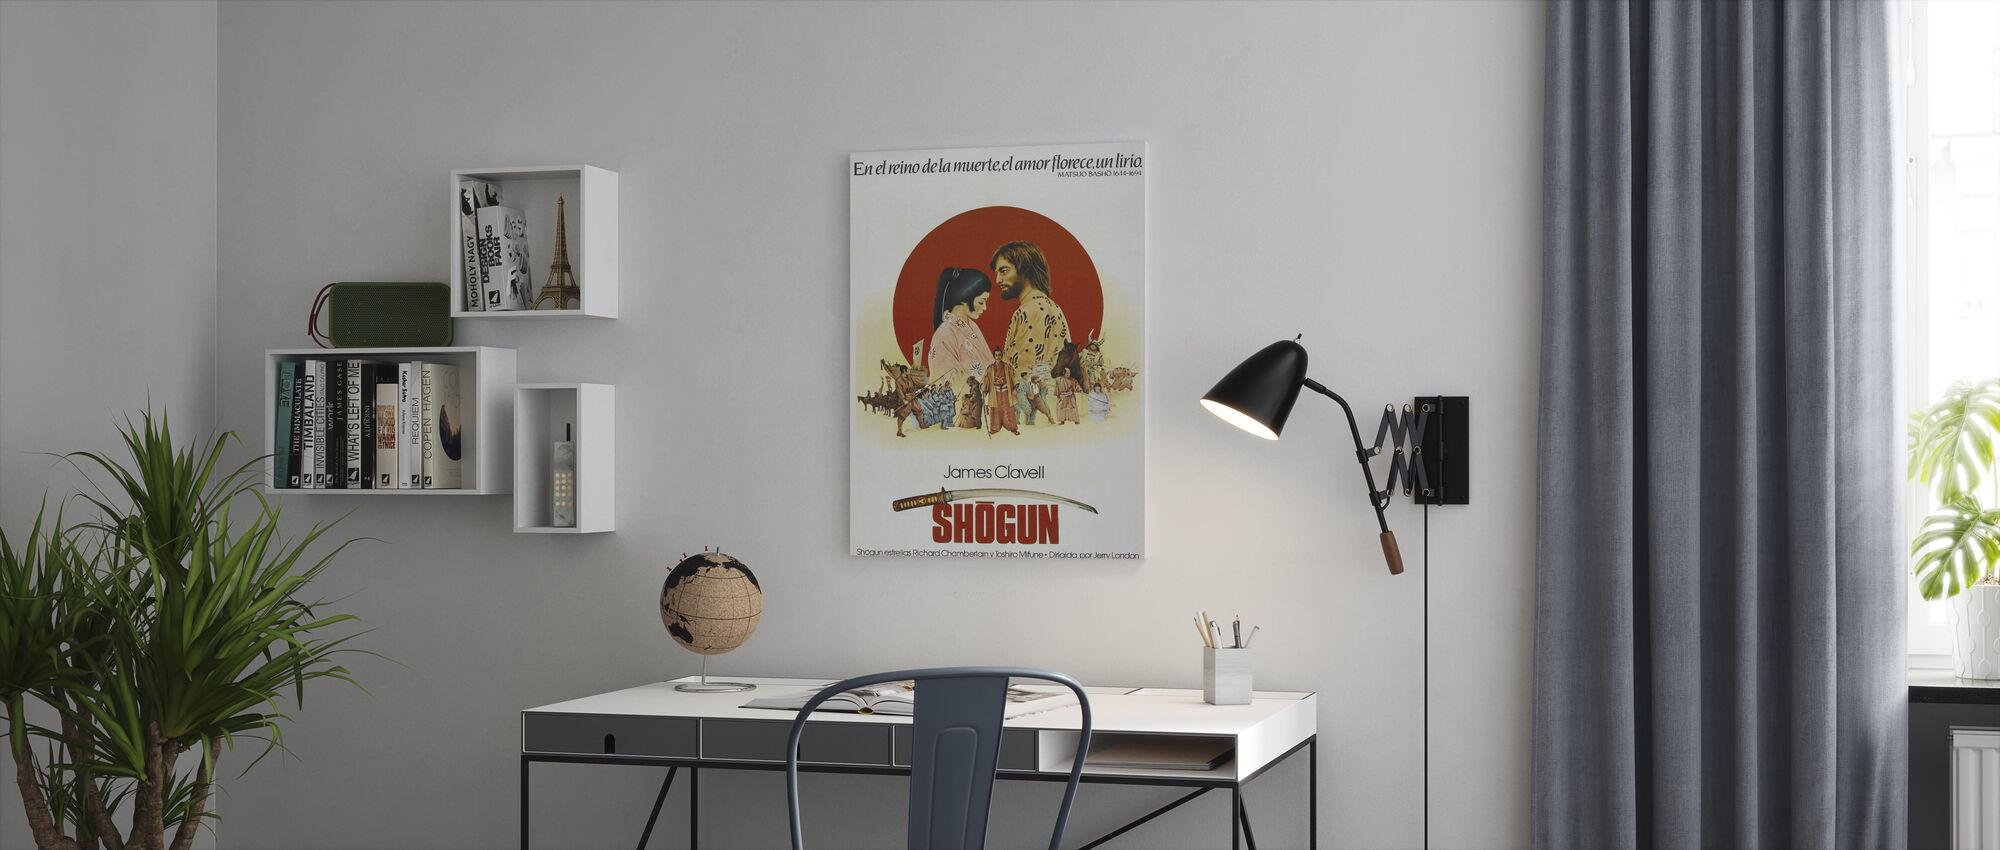 Argentinan Movie Poster Shogun - Canvas print - Office